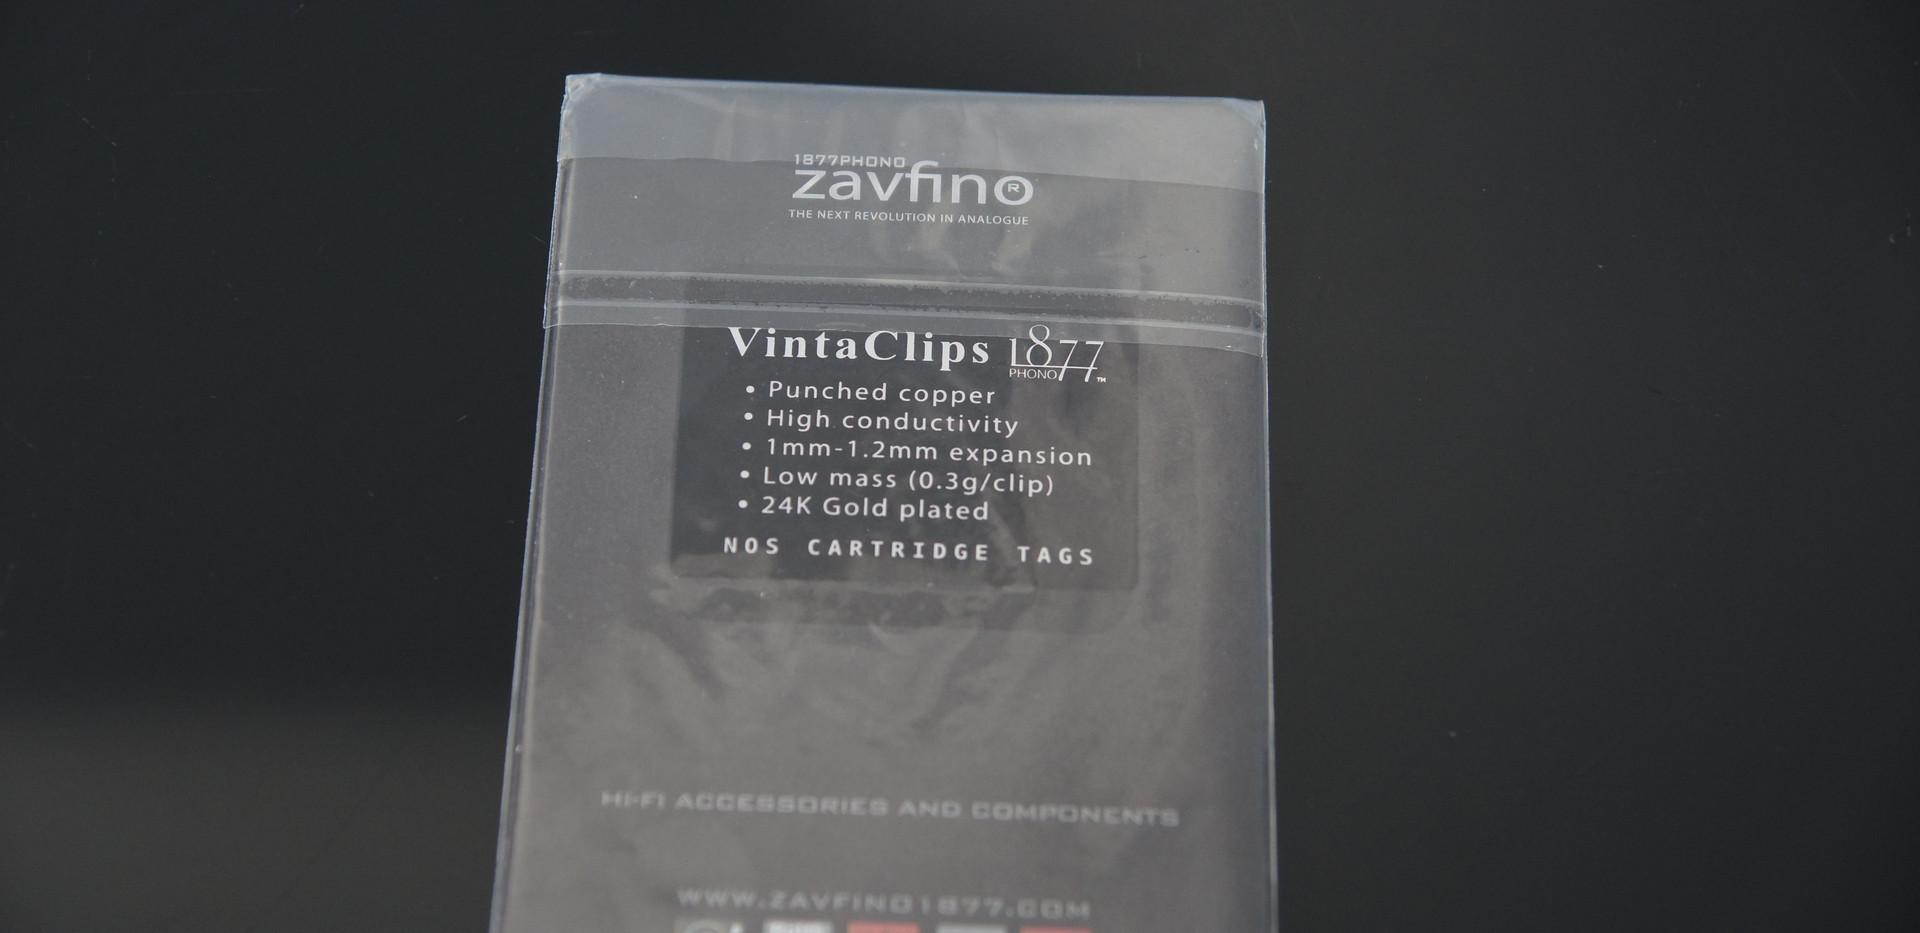 Zavfino Vintaclips